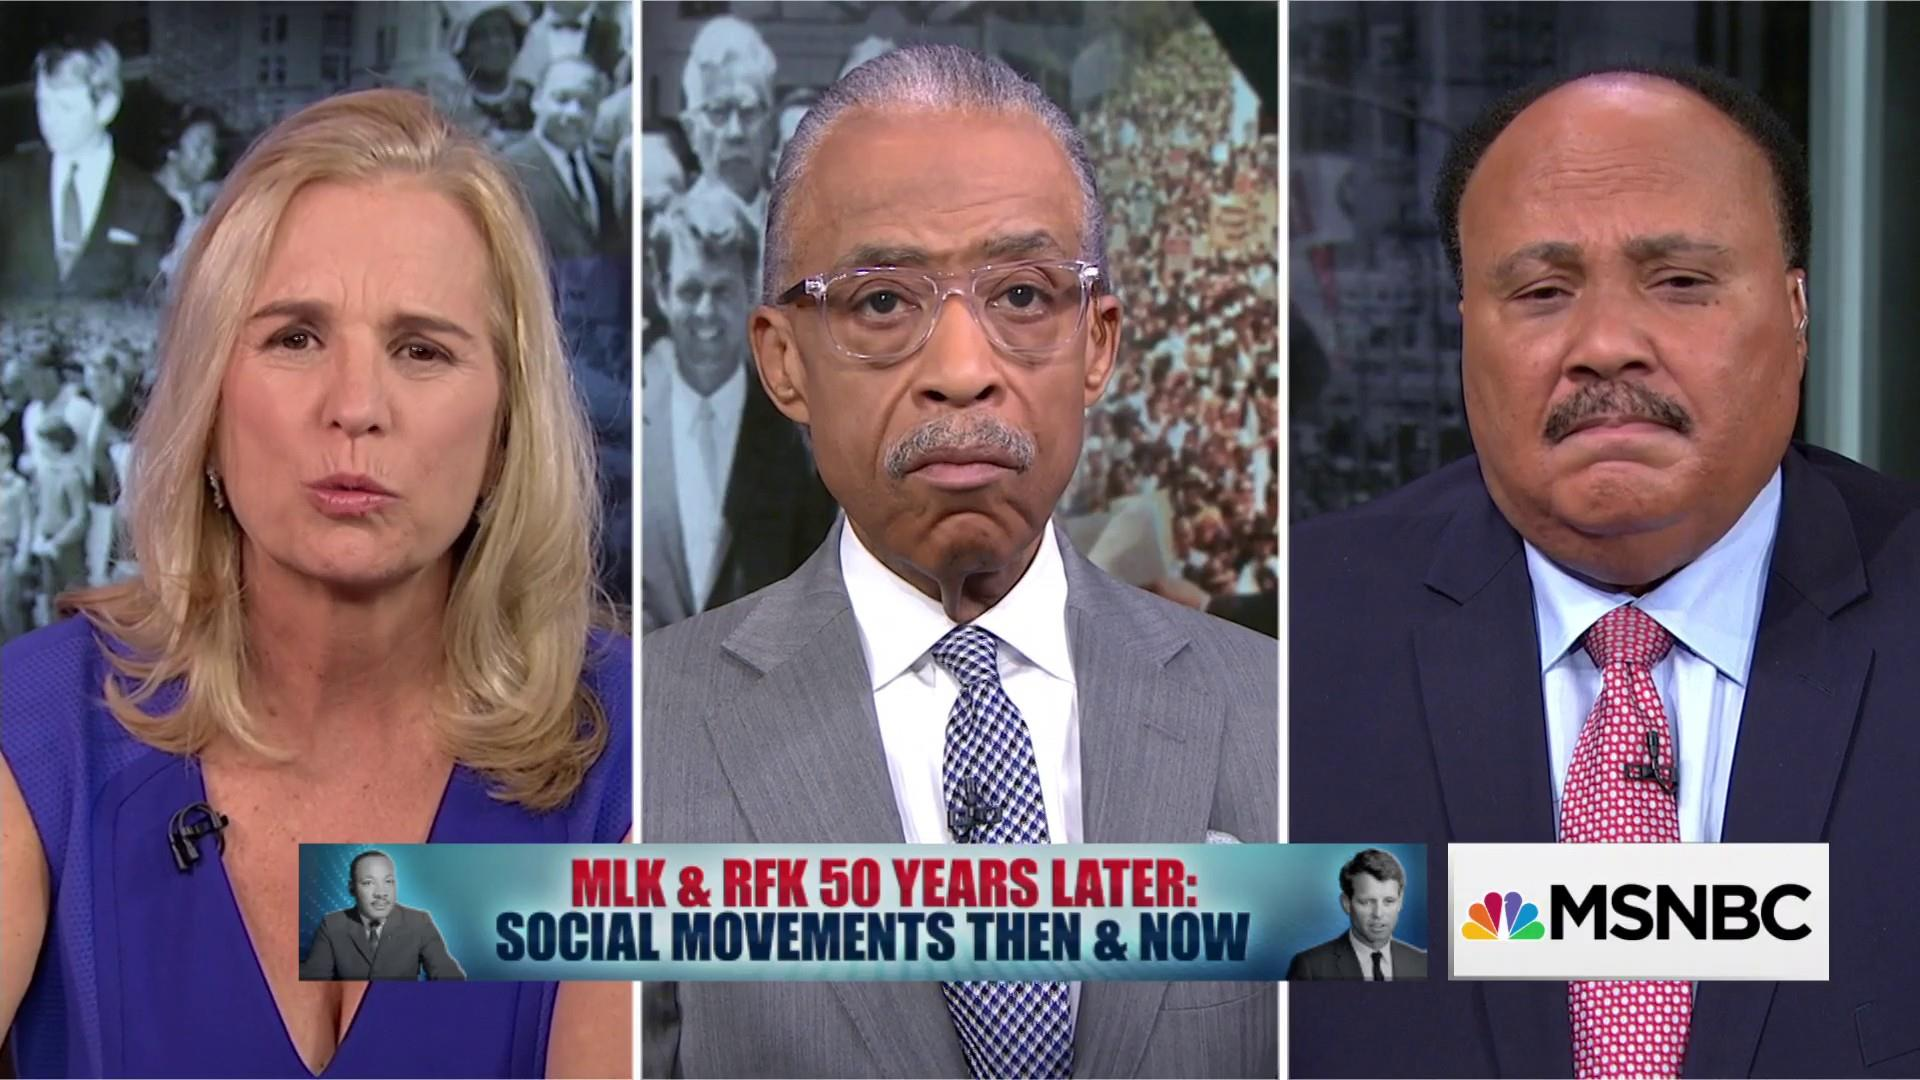 MLK & RFK: 50 Years Later